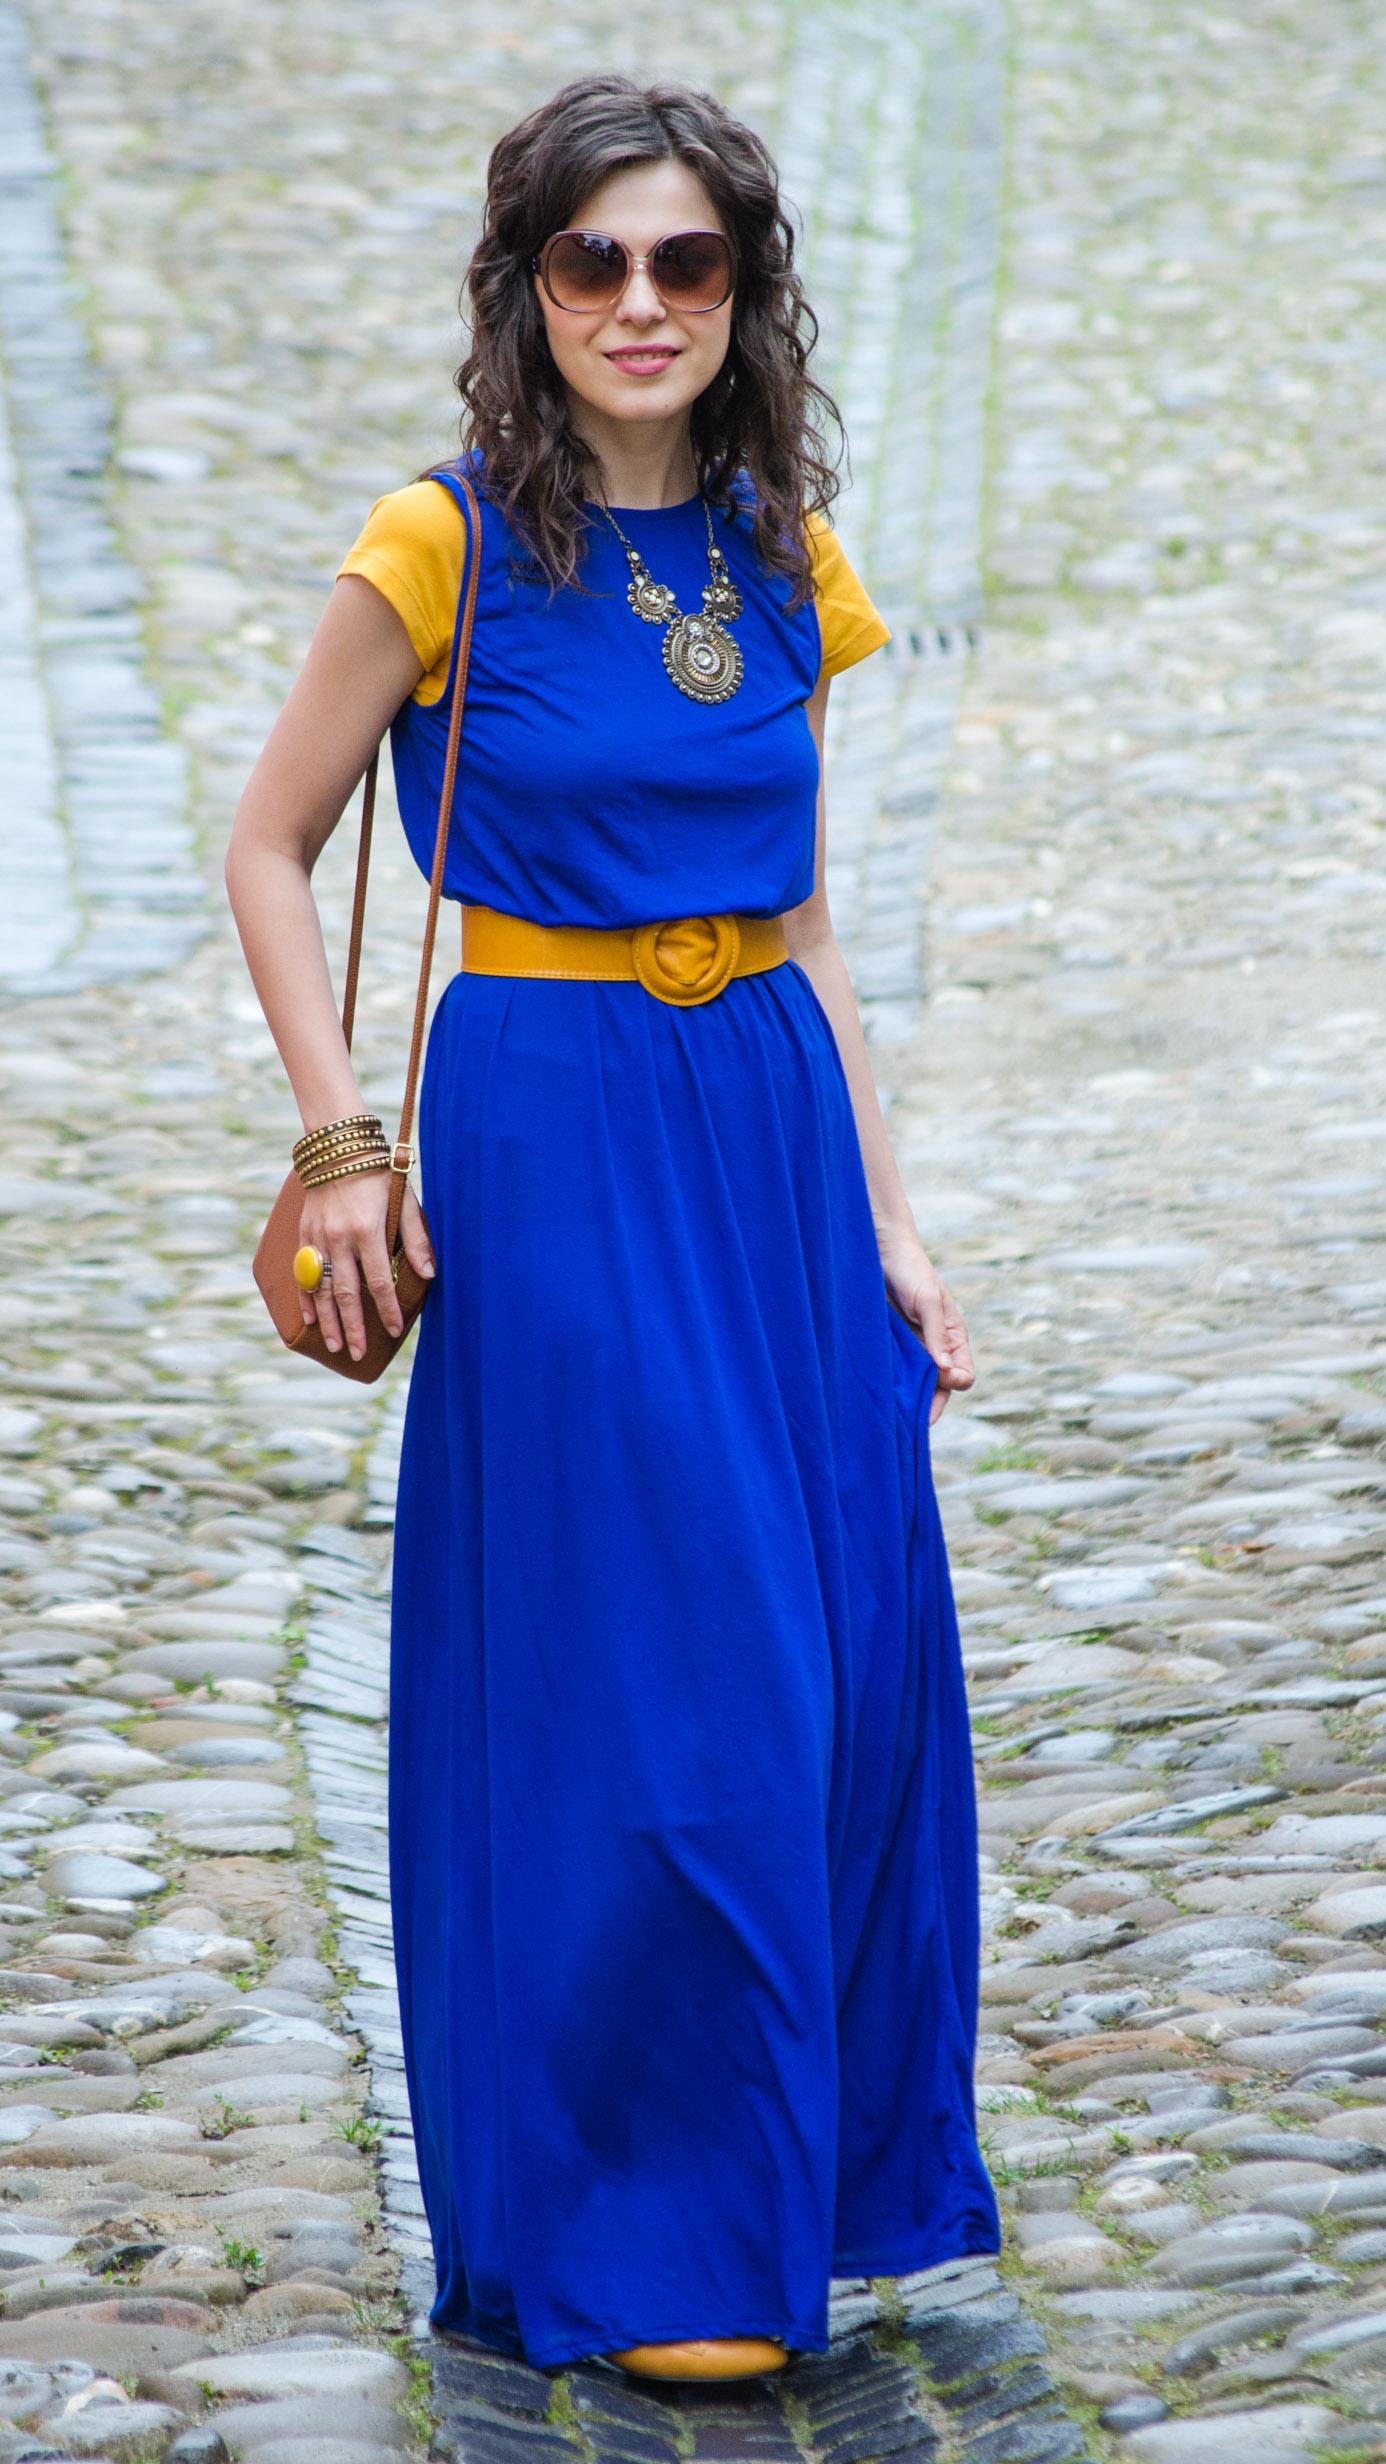 Cobalt blue dress and shoes